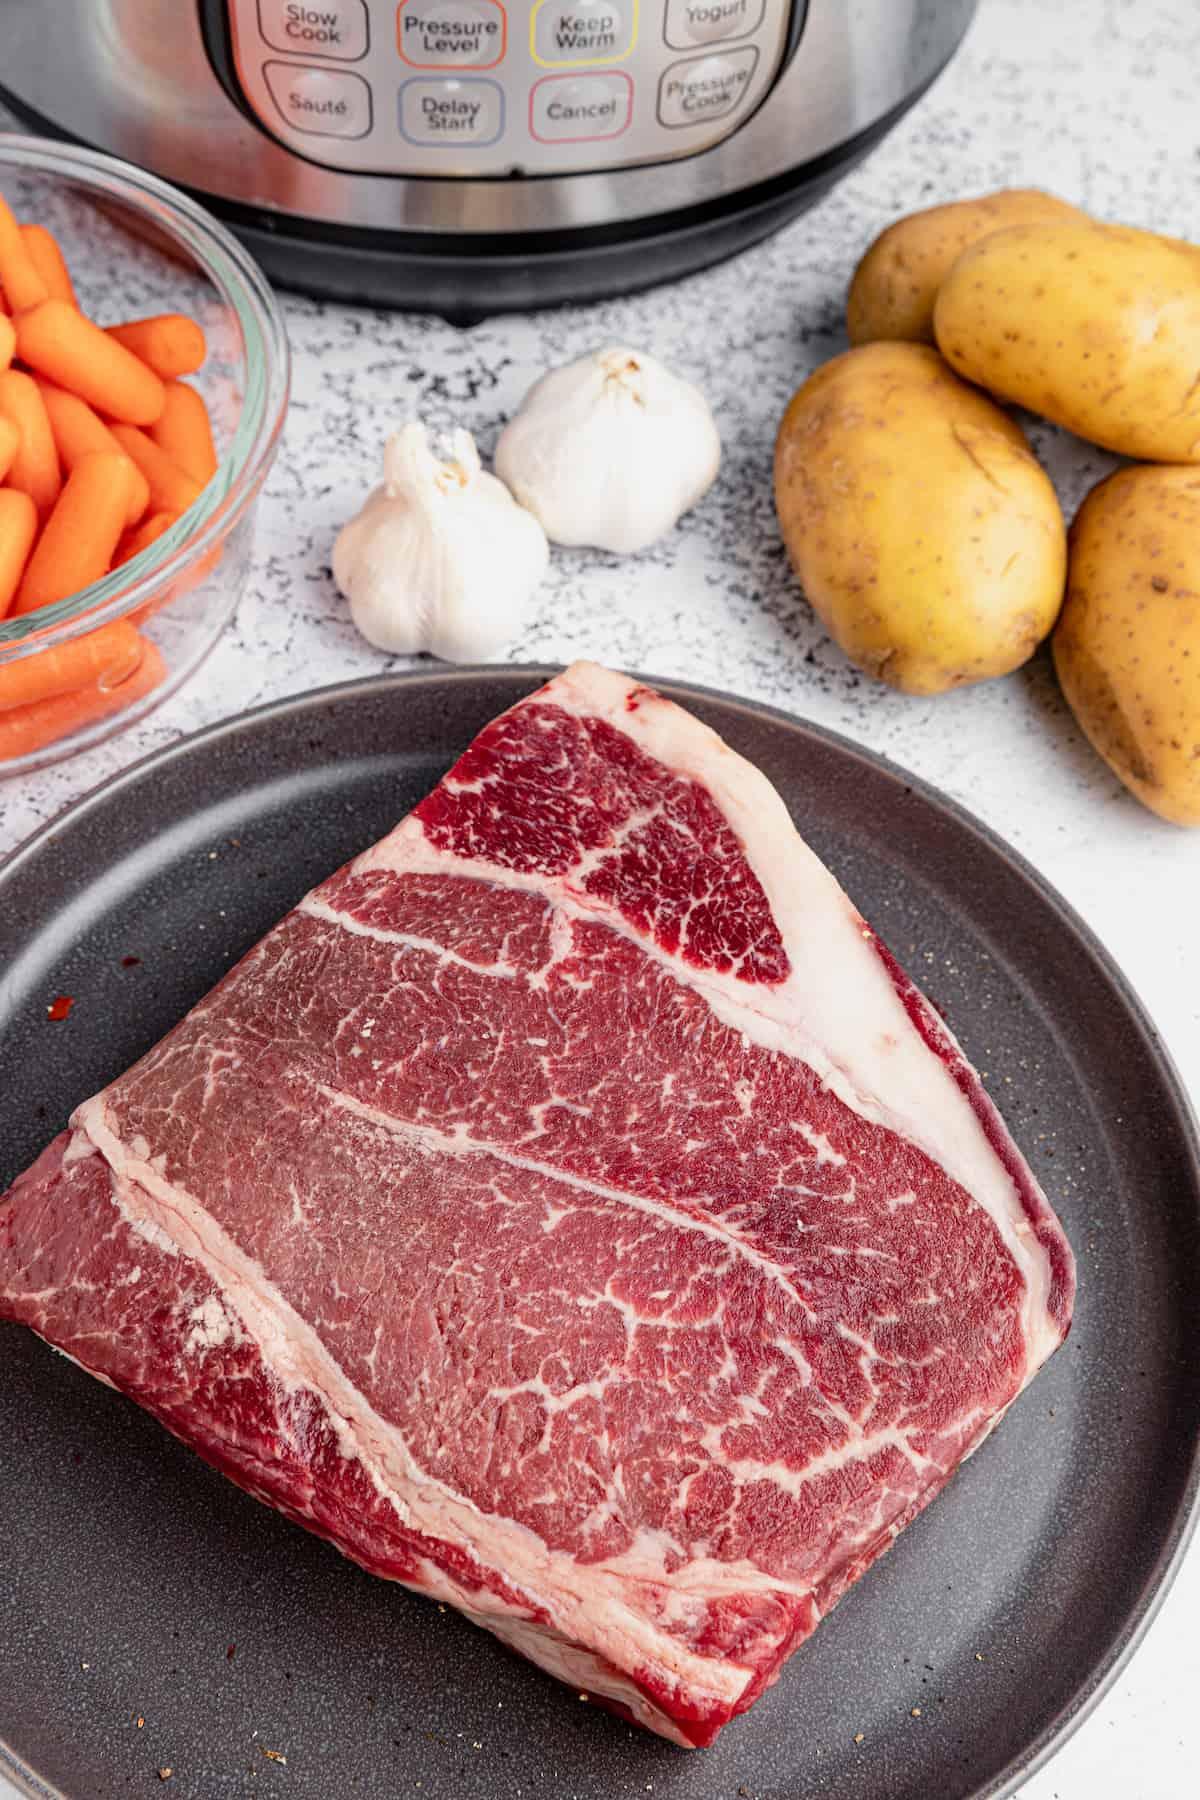 steak, potatoes, garlic and carrots